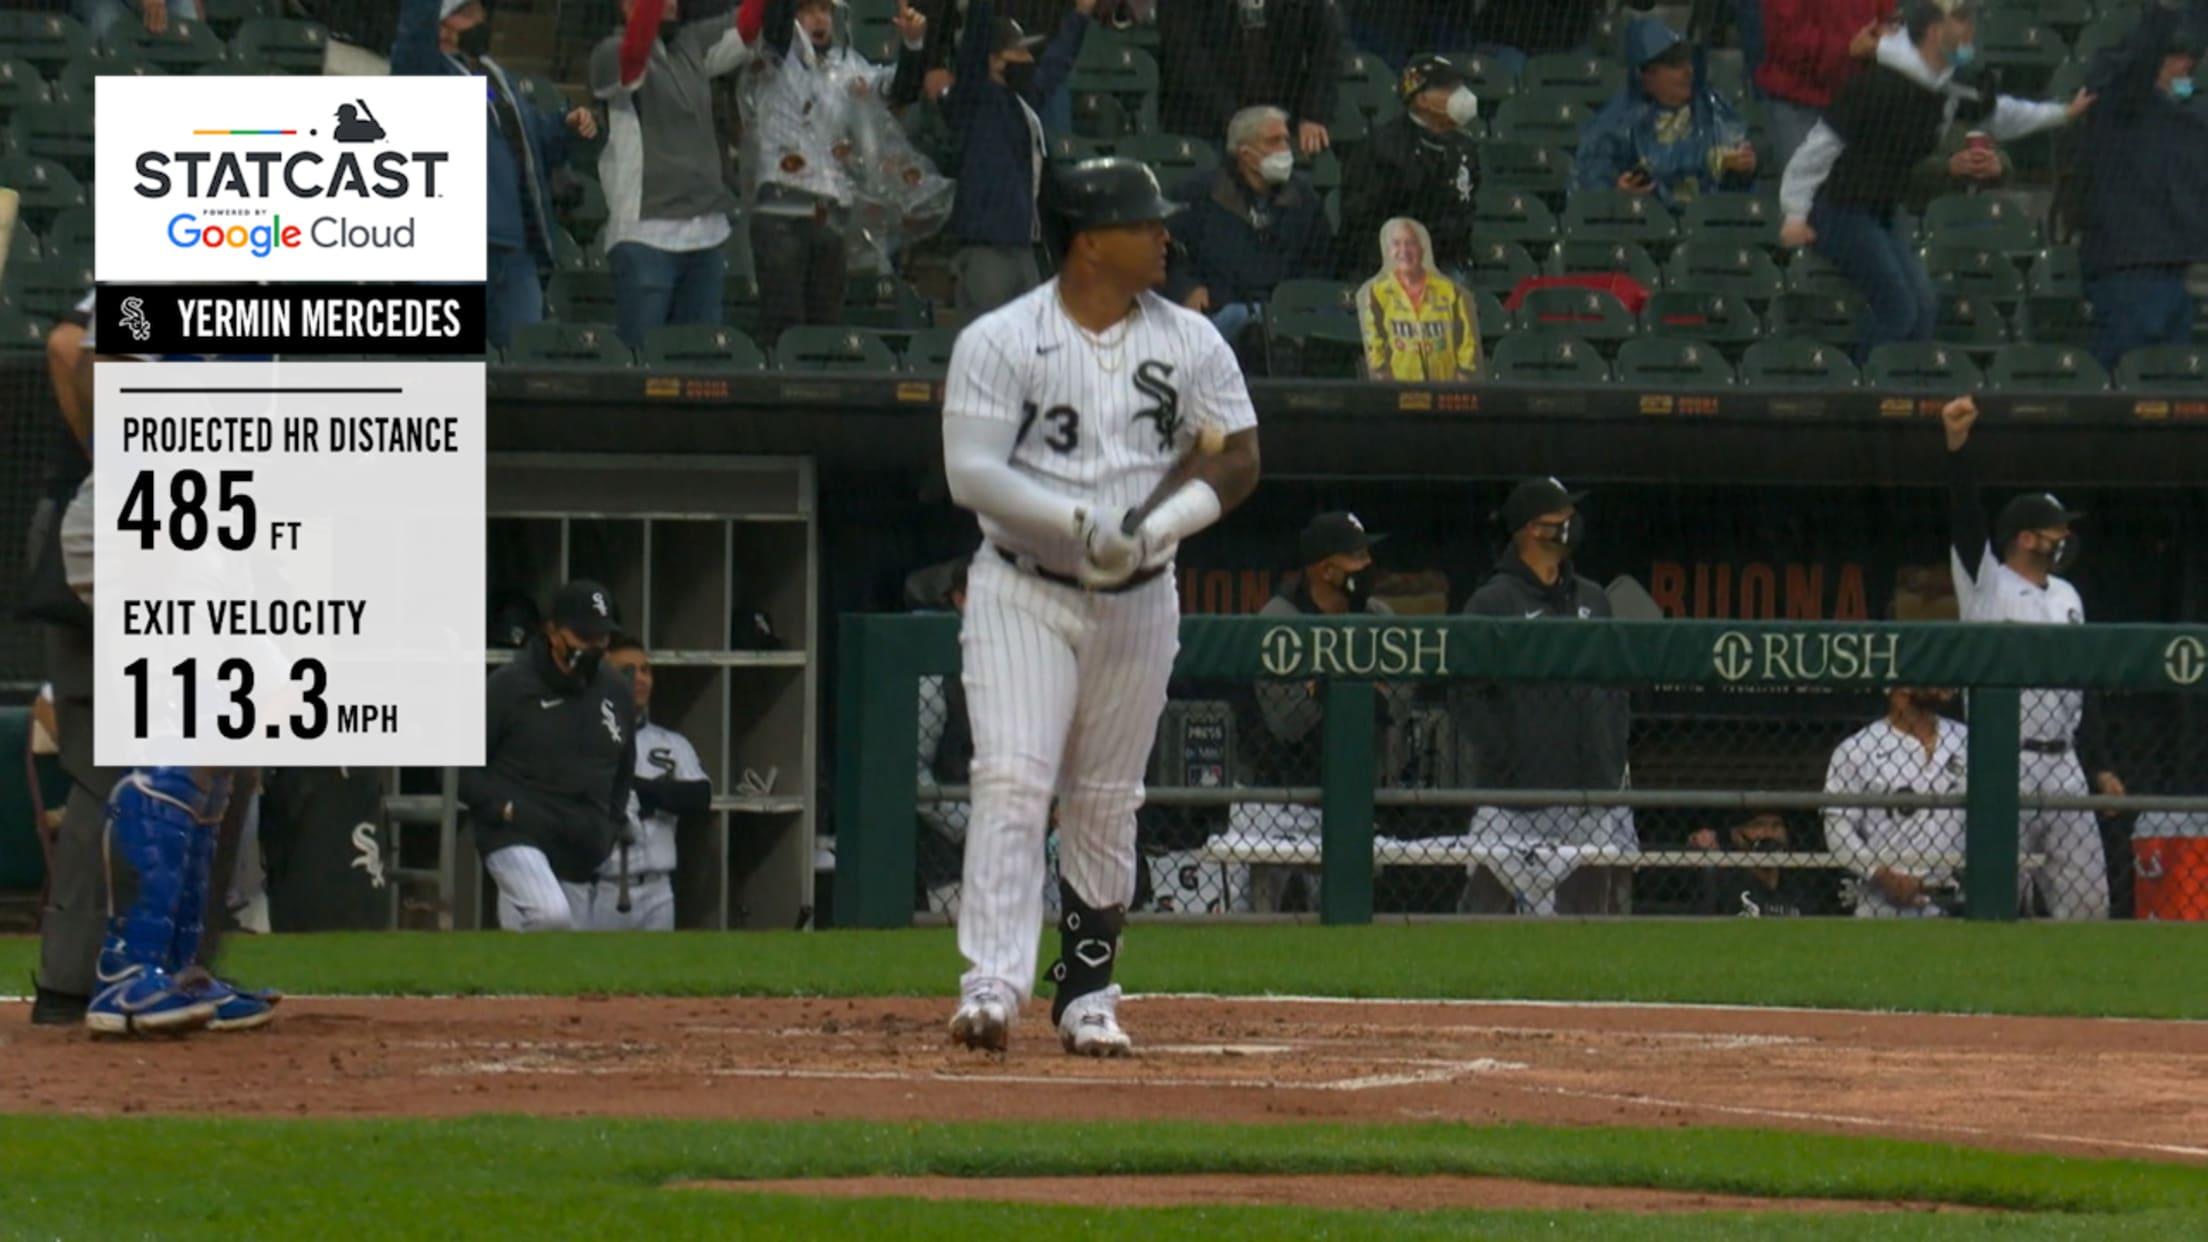 Yermín Mercedes' 485-ft. home run